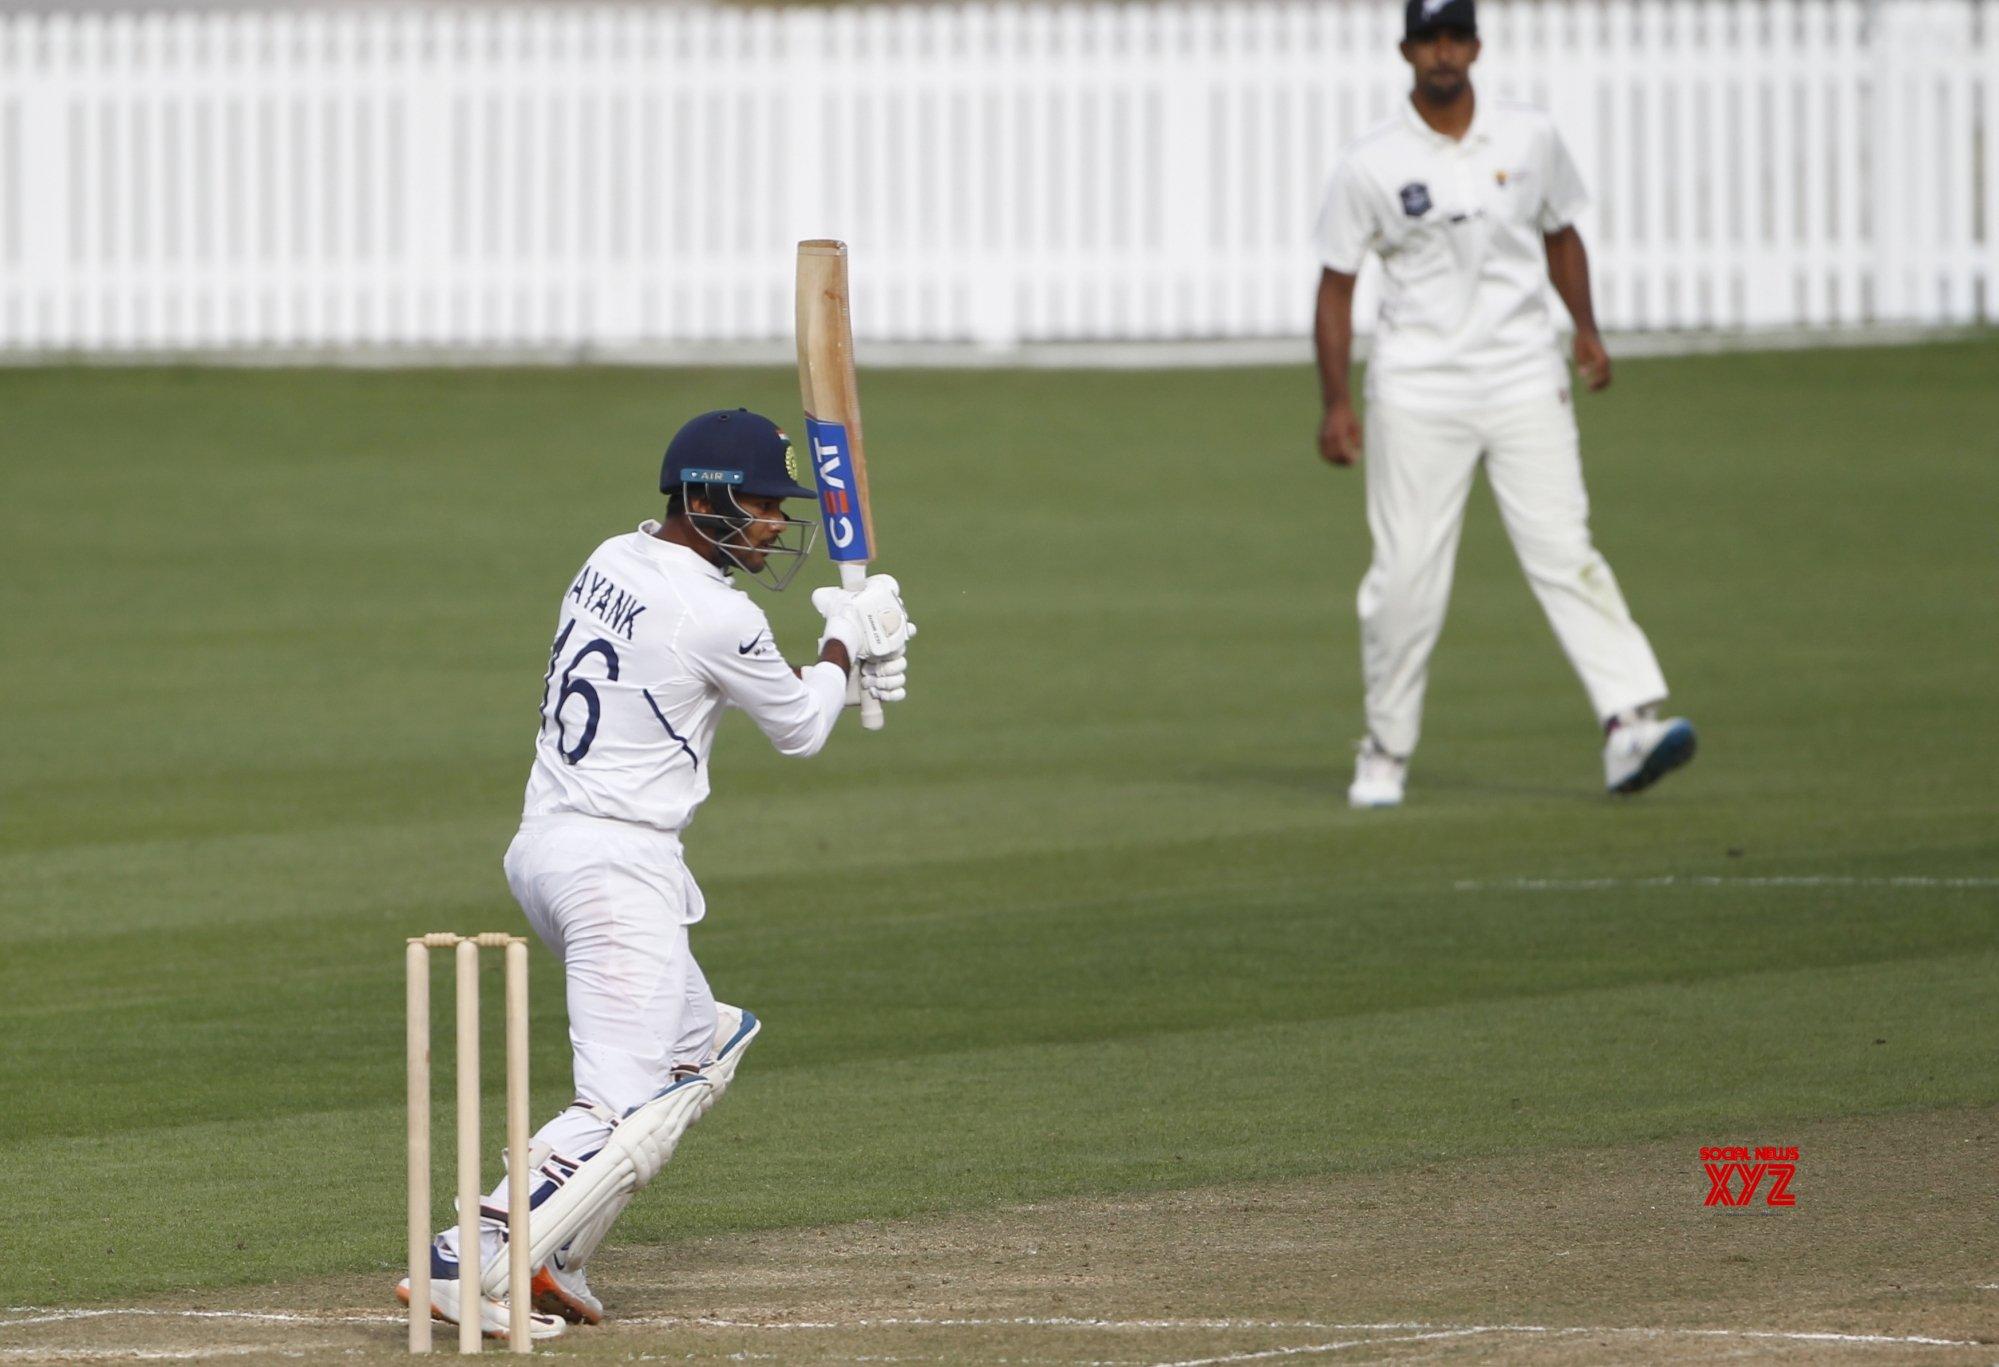 Hamilton: Practice match - Day 2 - India Vs New Zealand (Batch - 2) #Gallery